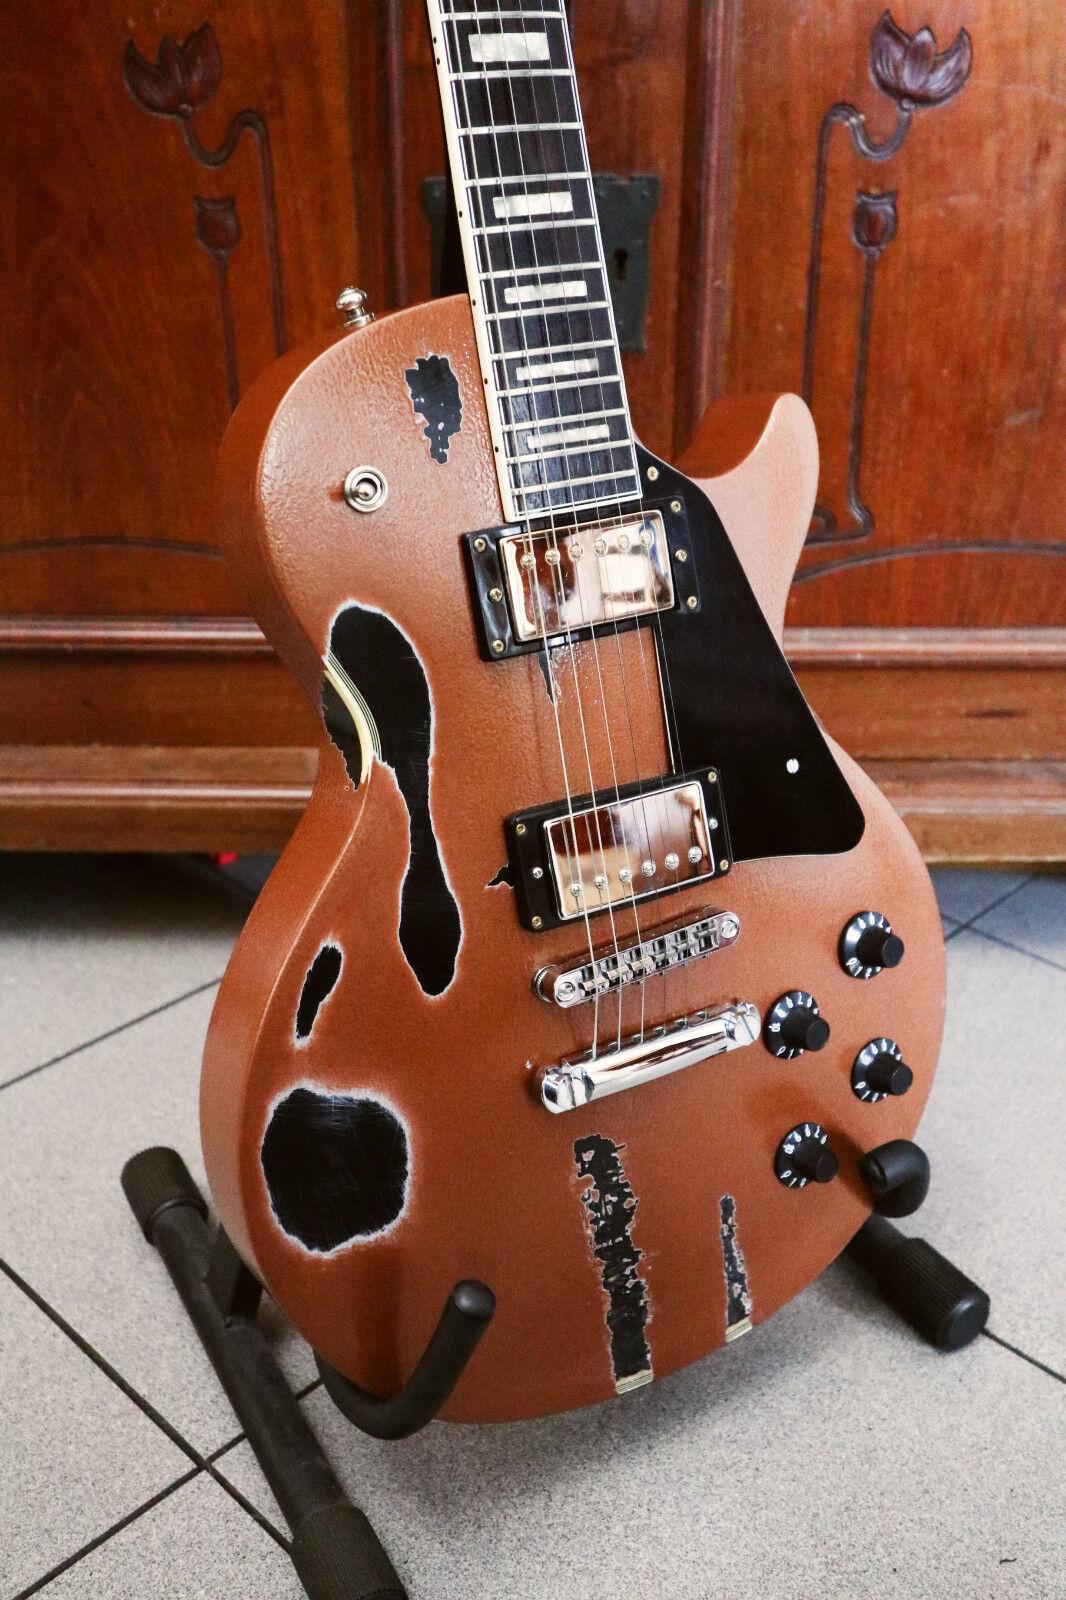 1970s Les Paul Goldtop Custom Relic Black Beauty Vintage Lawsuit Guitar Japan